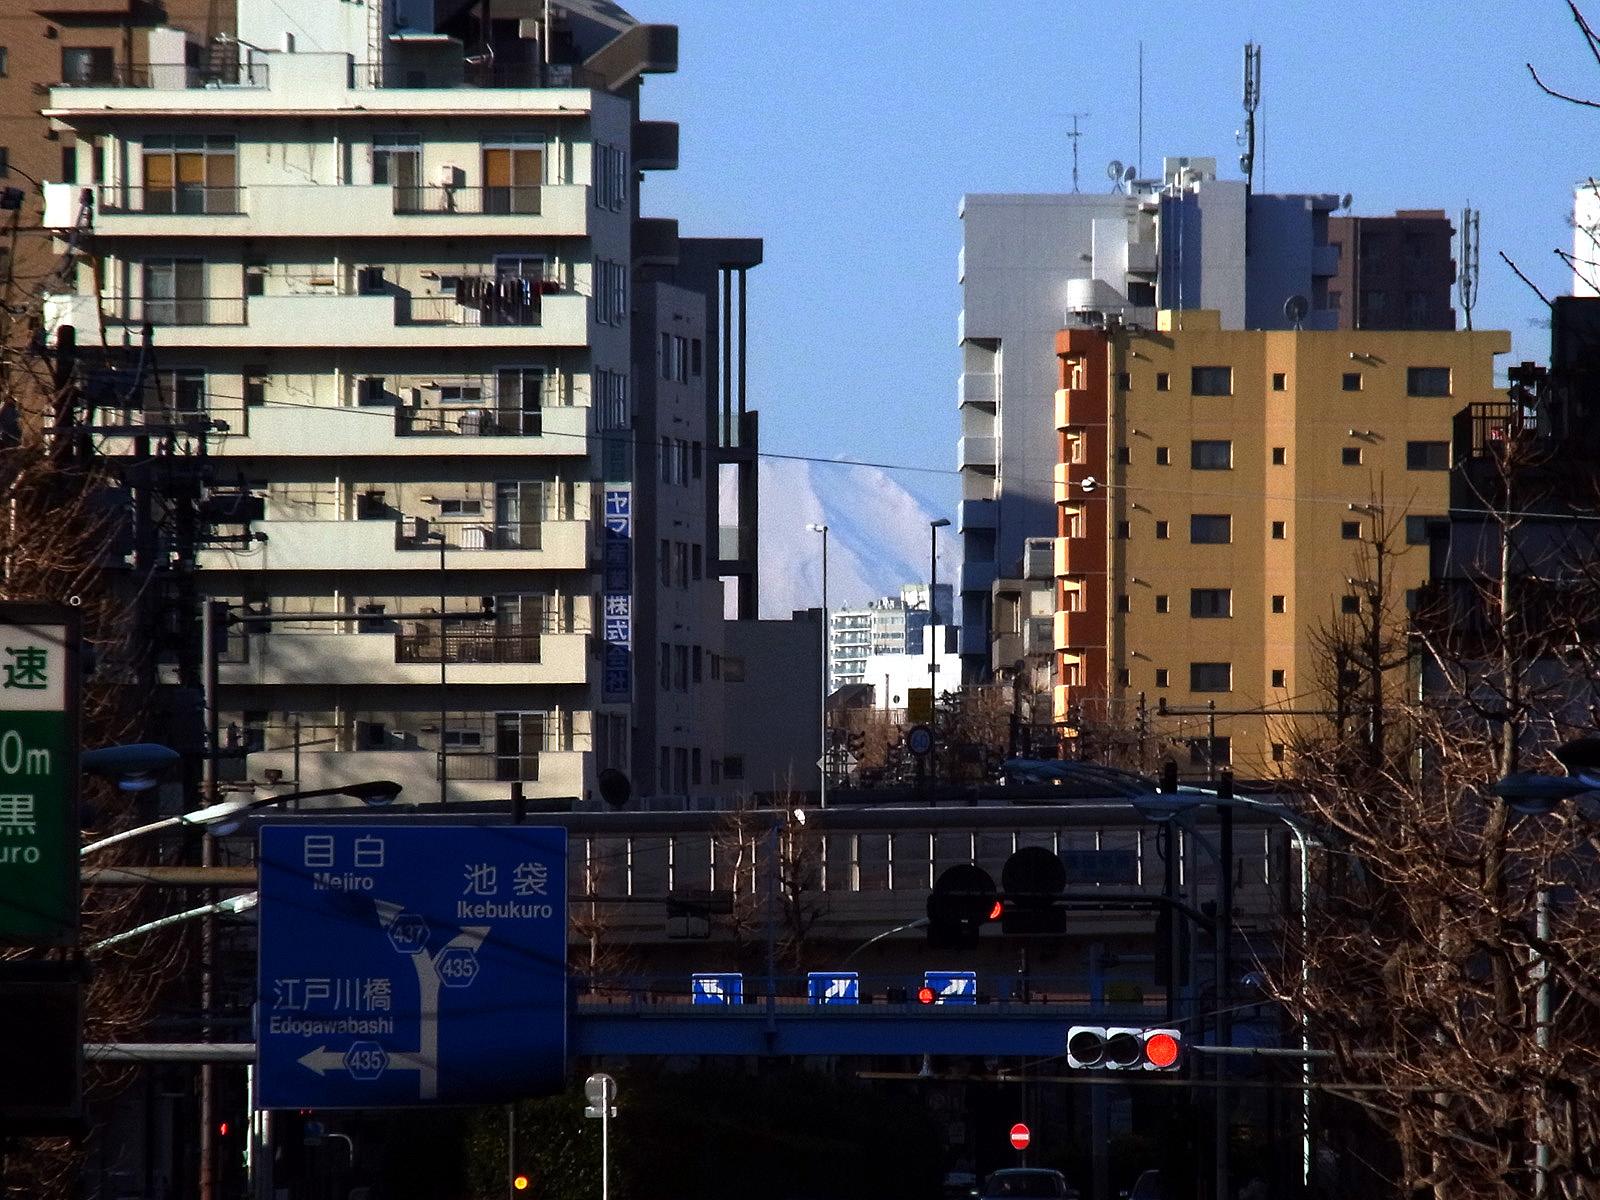 011_1 富士見坂(大塚)より富士山(2013_0120_090129)